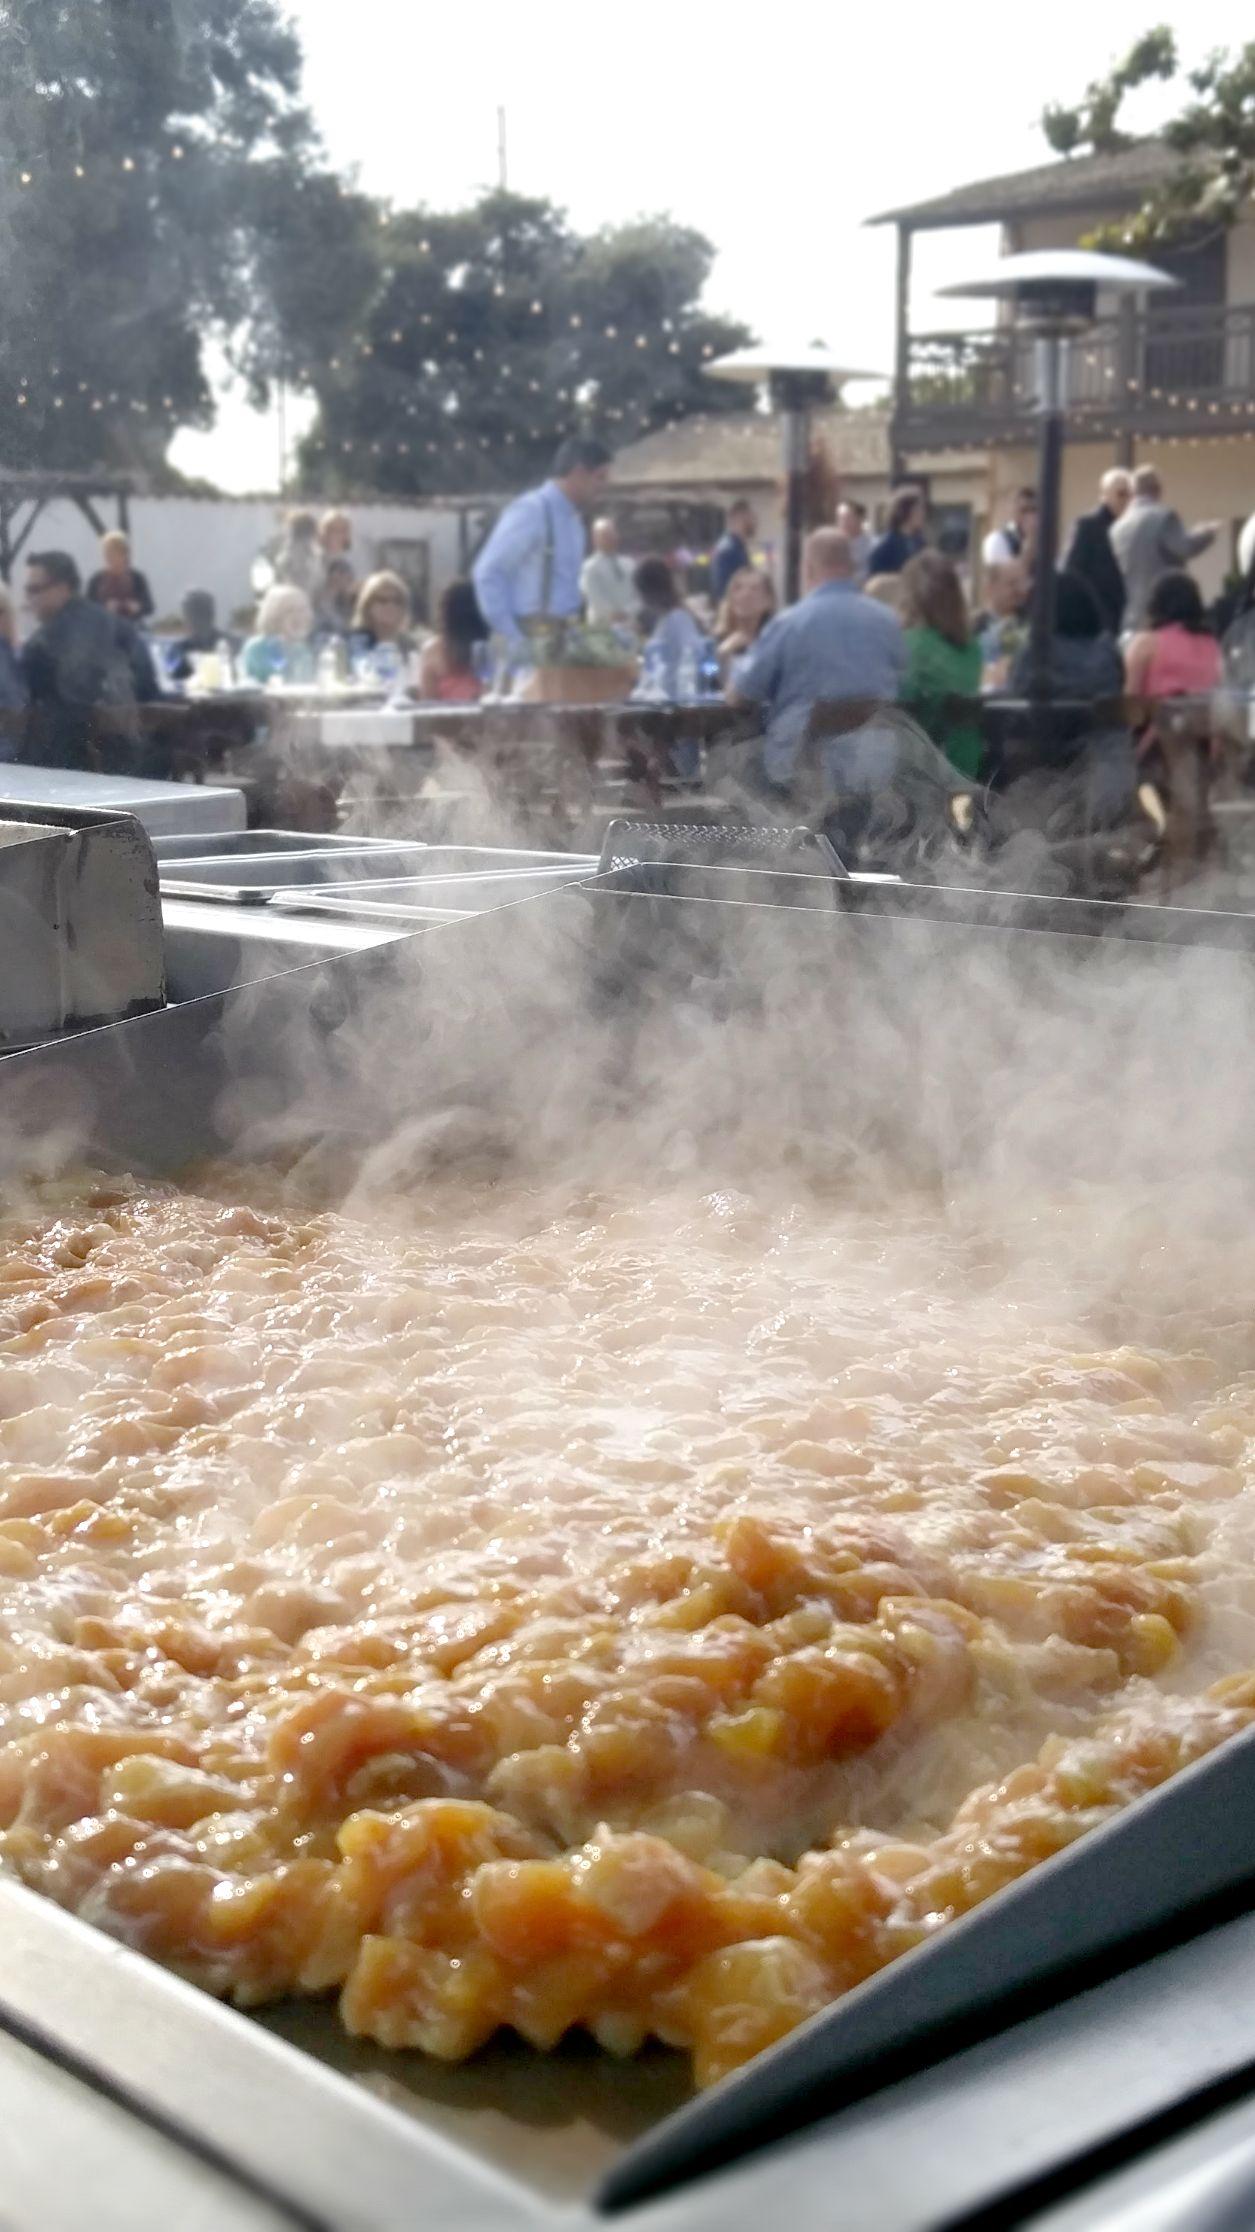 Gourmet taco wedding catering with pollo asado on the